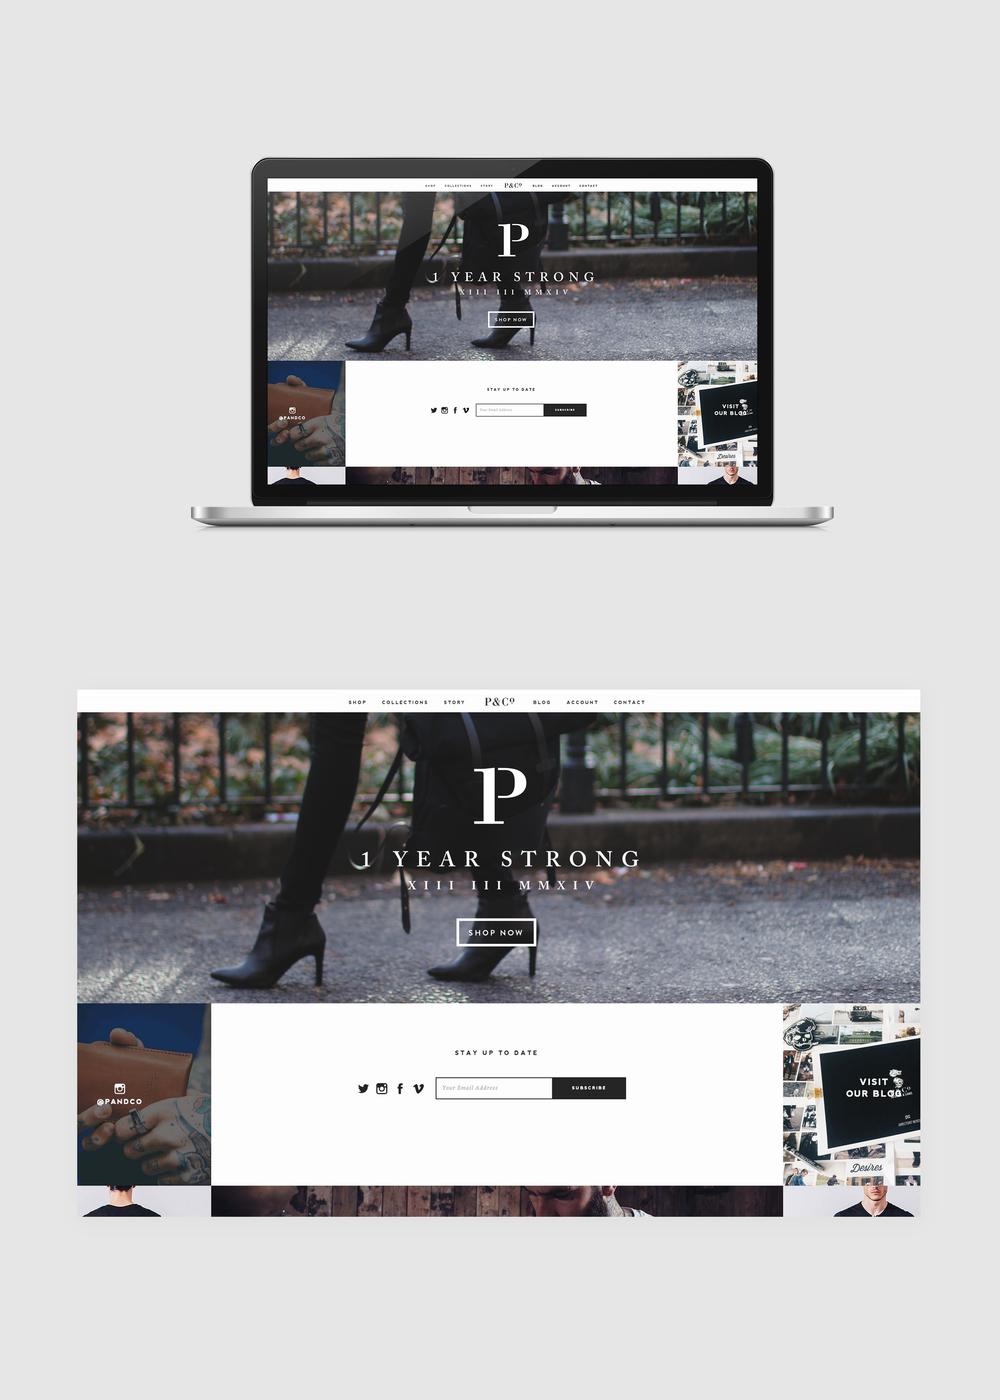 pandco_presentation_09.jpg